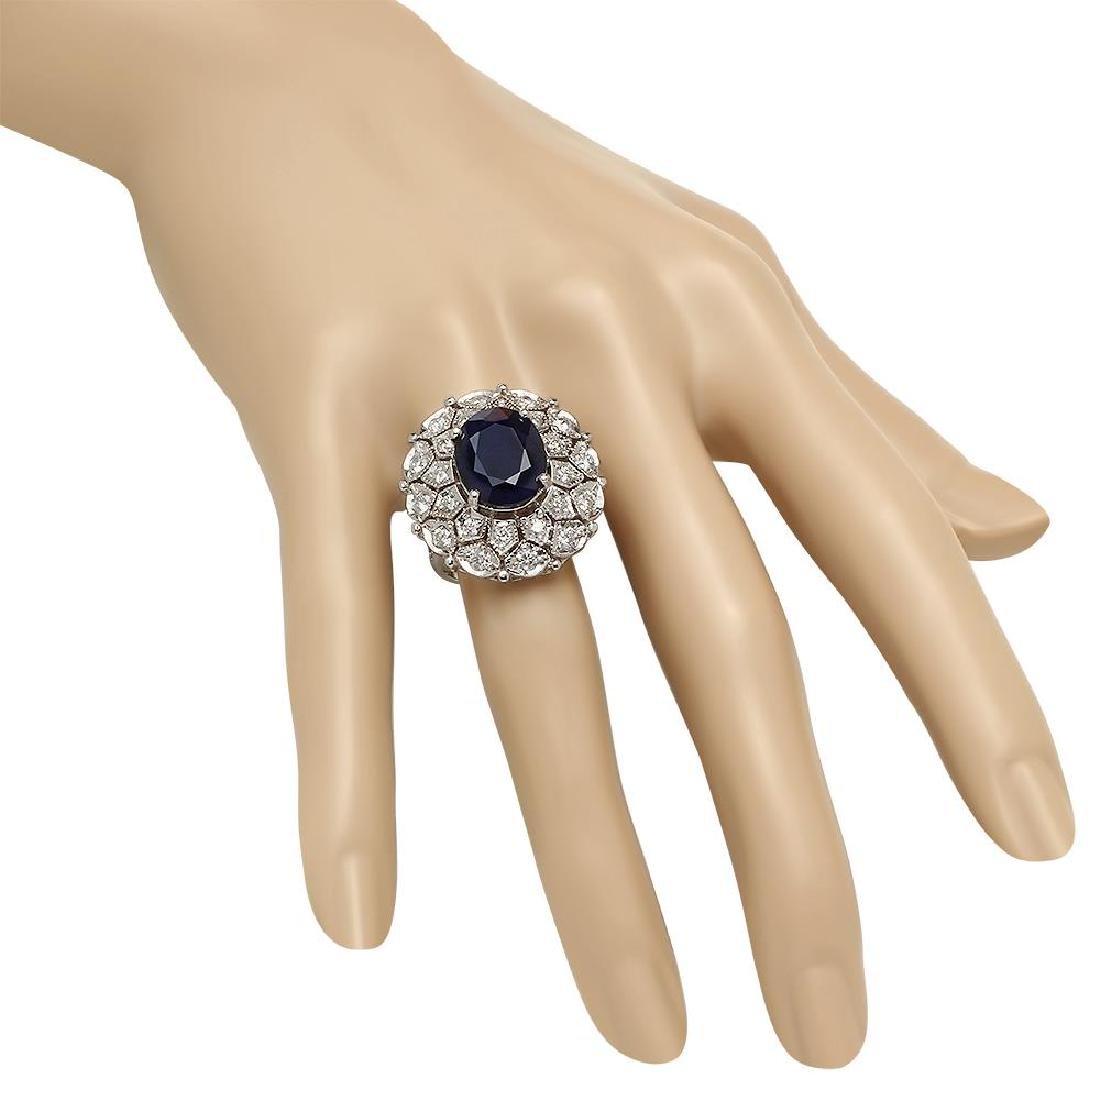 14K Gold 9.23ct Sapphire 1.72ct Diamond Ring - 3